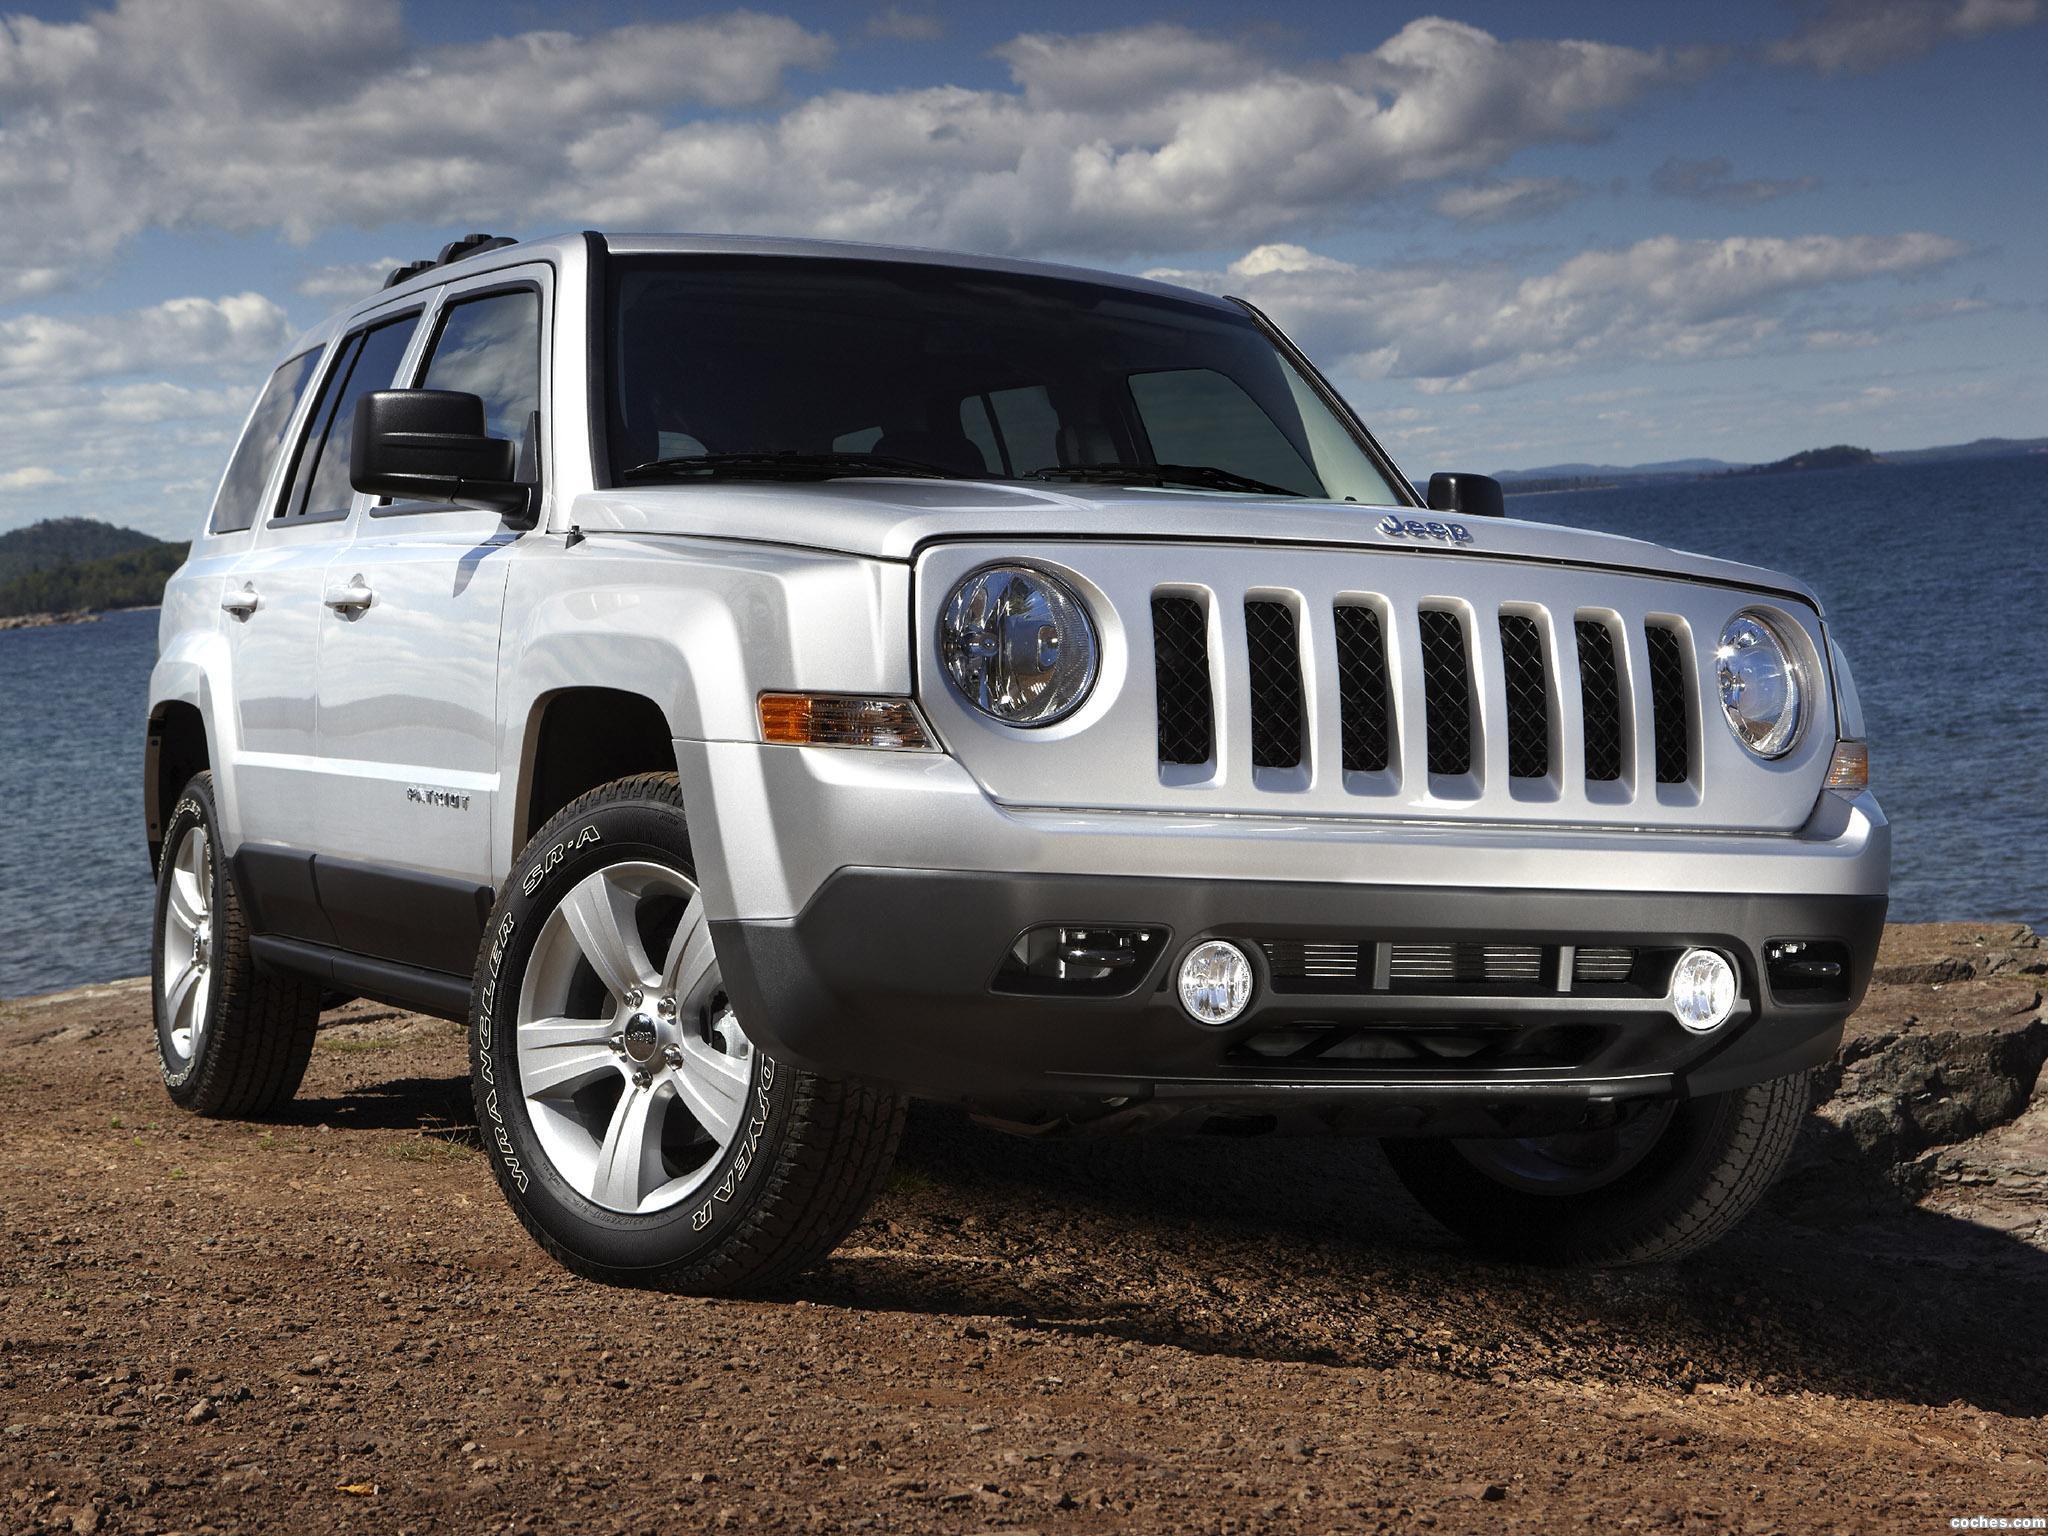 jeep_patriot-2010_r24.jpg